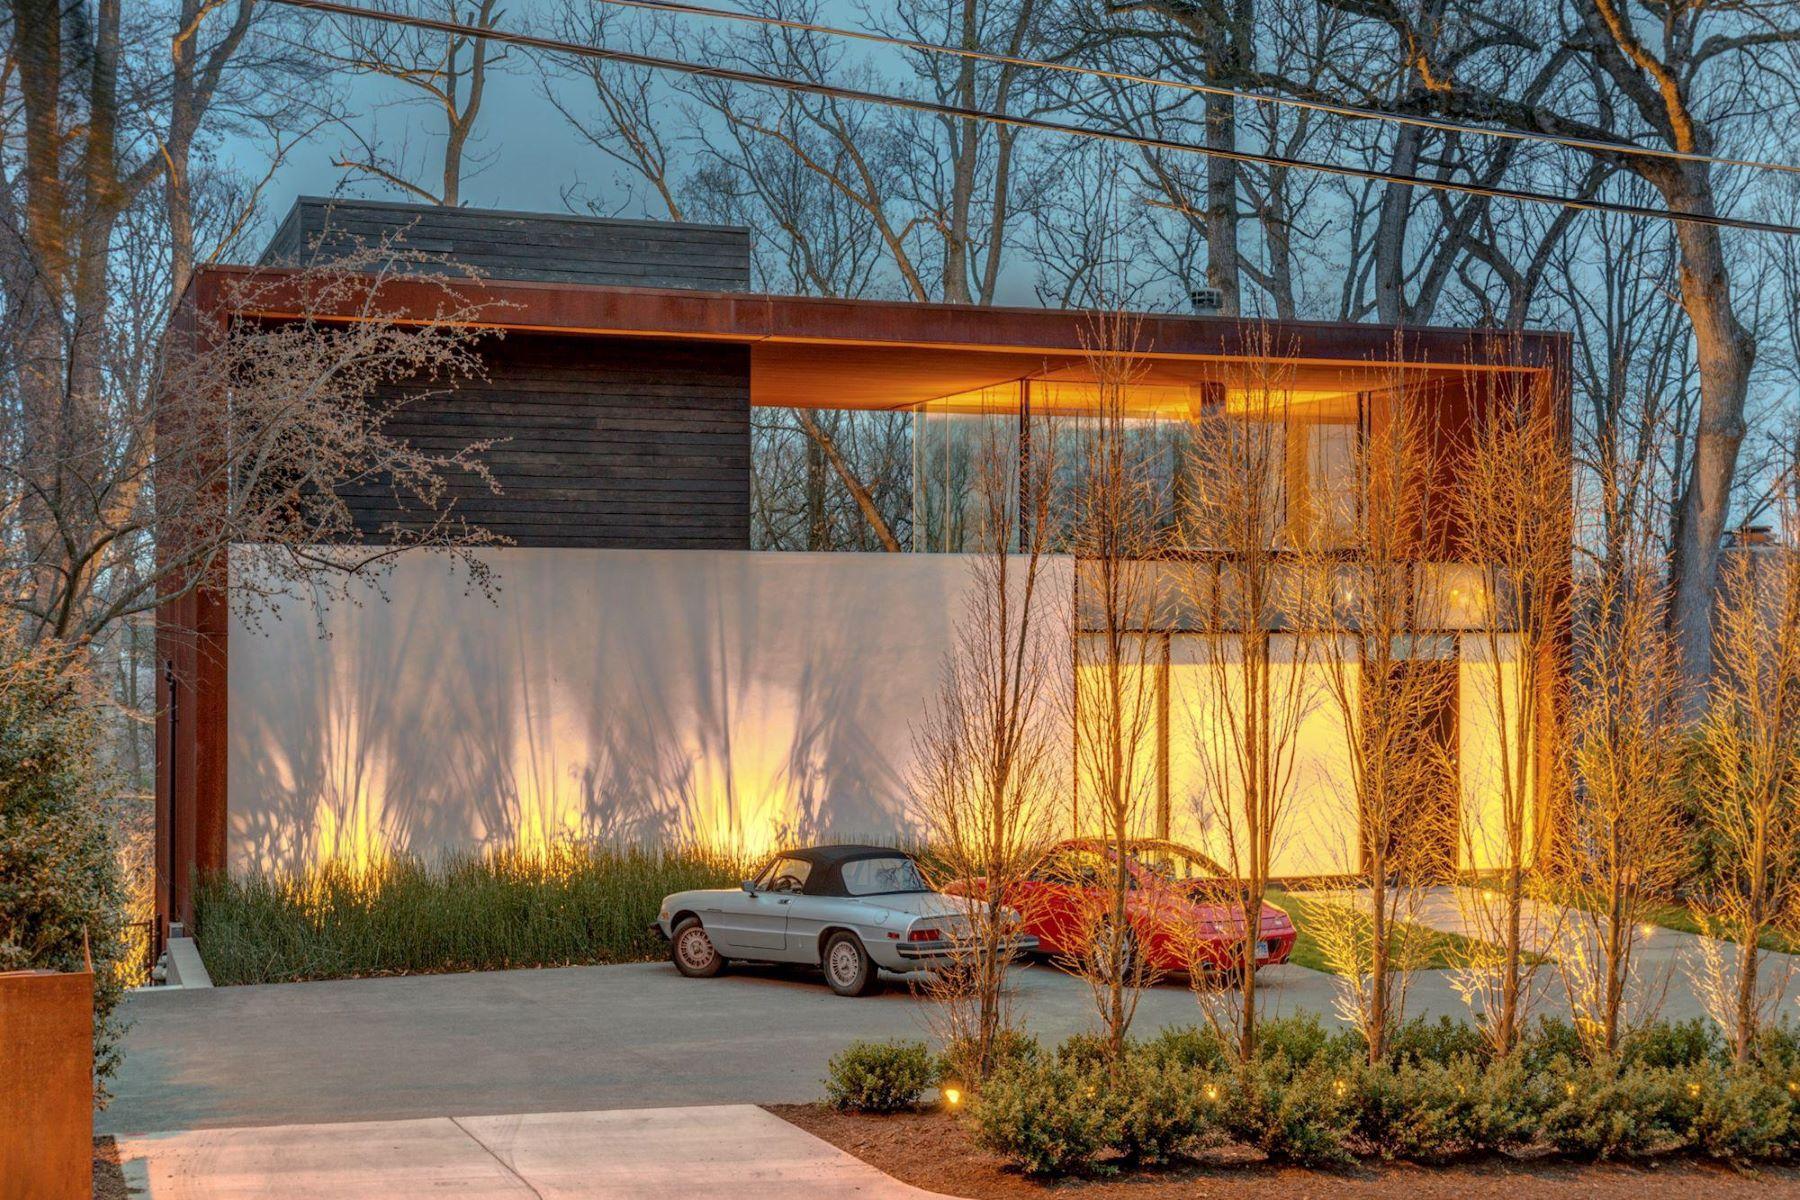 Single Family Homes for Sale at 6415 Dahlonega Rd Bethesda, Maryland 20816 United States